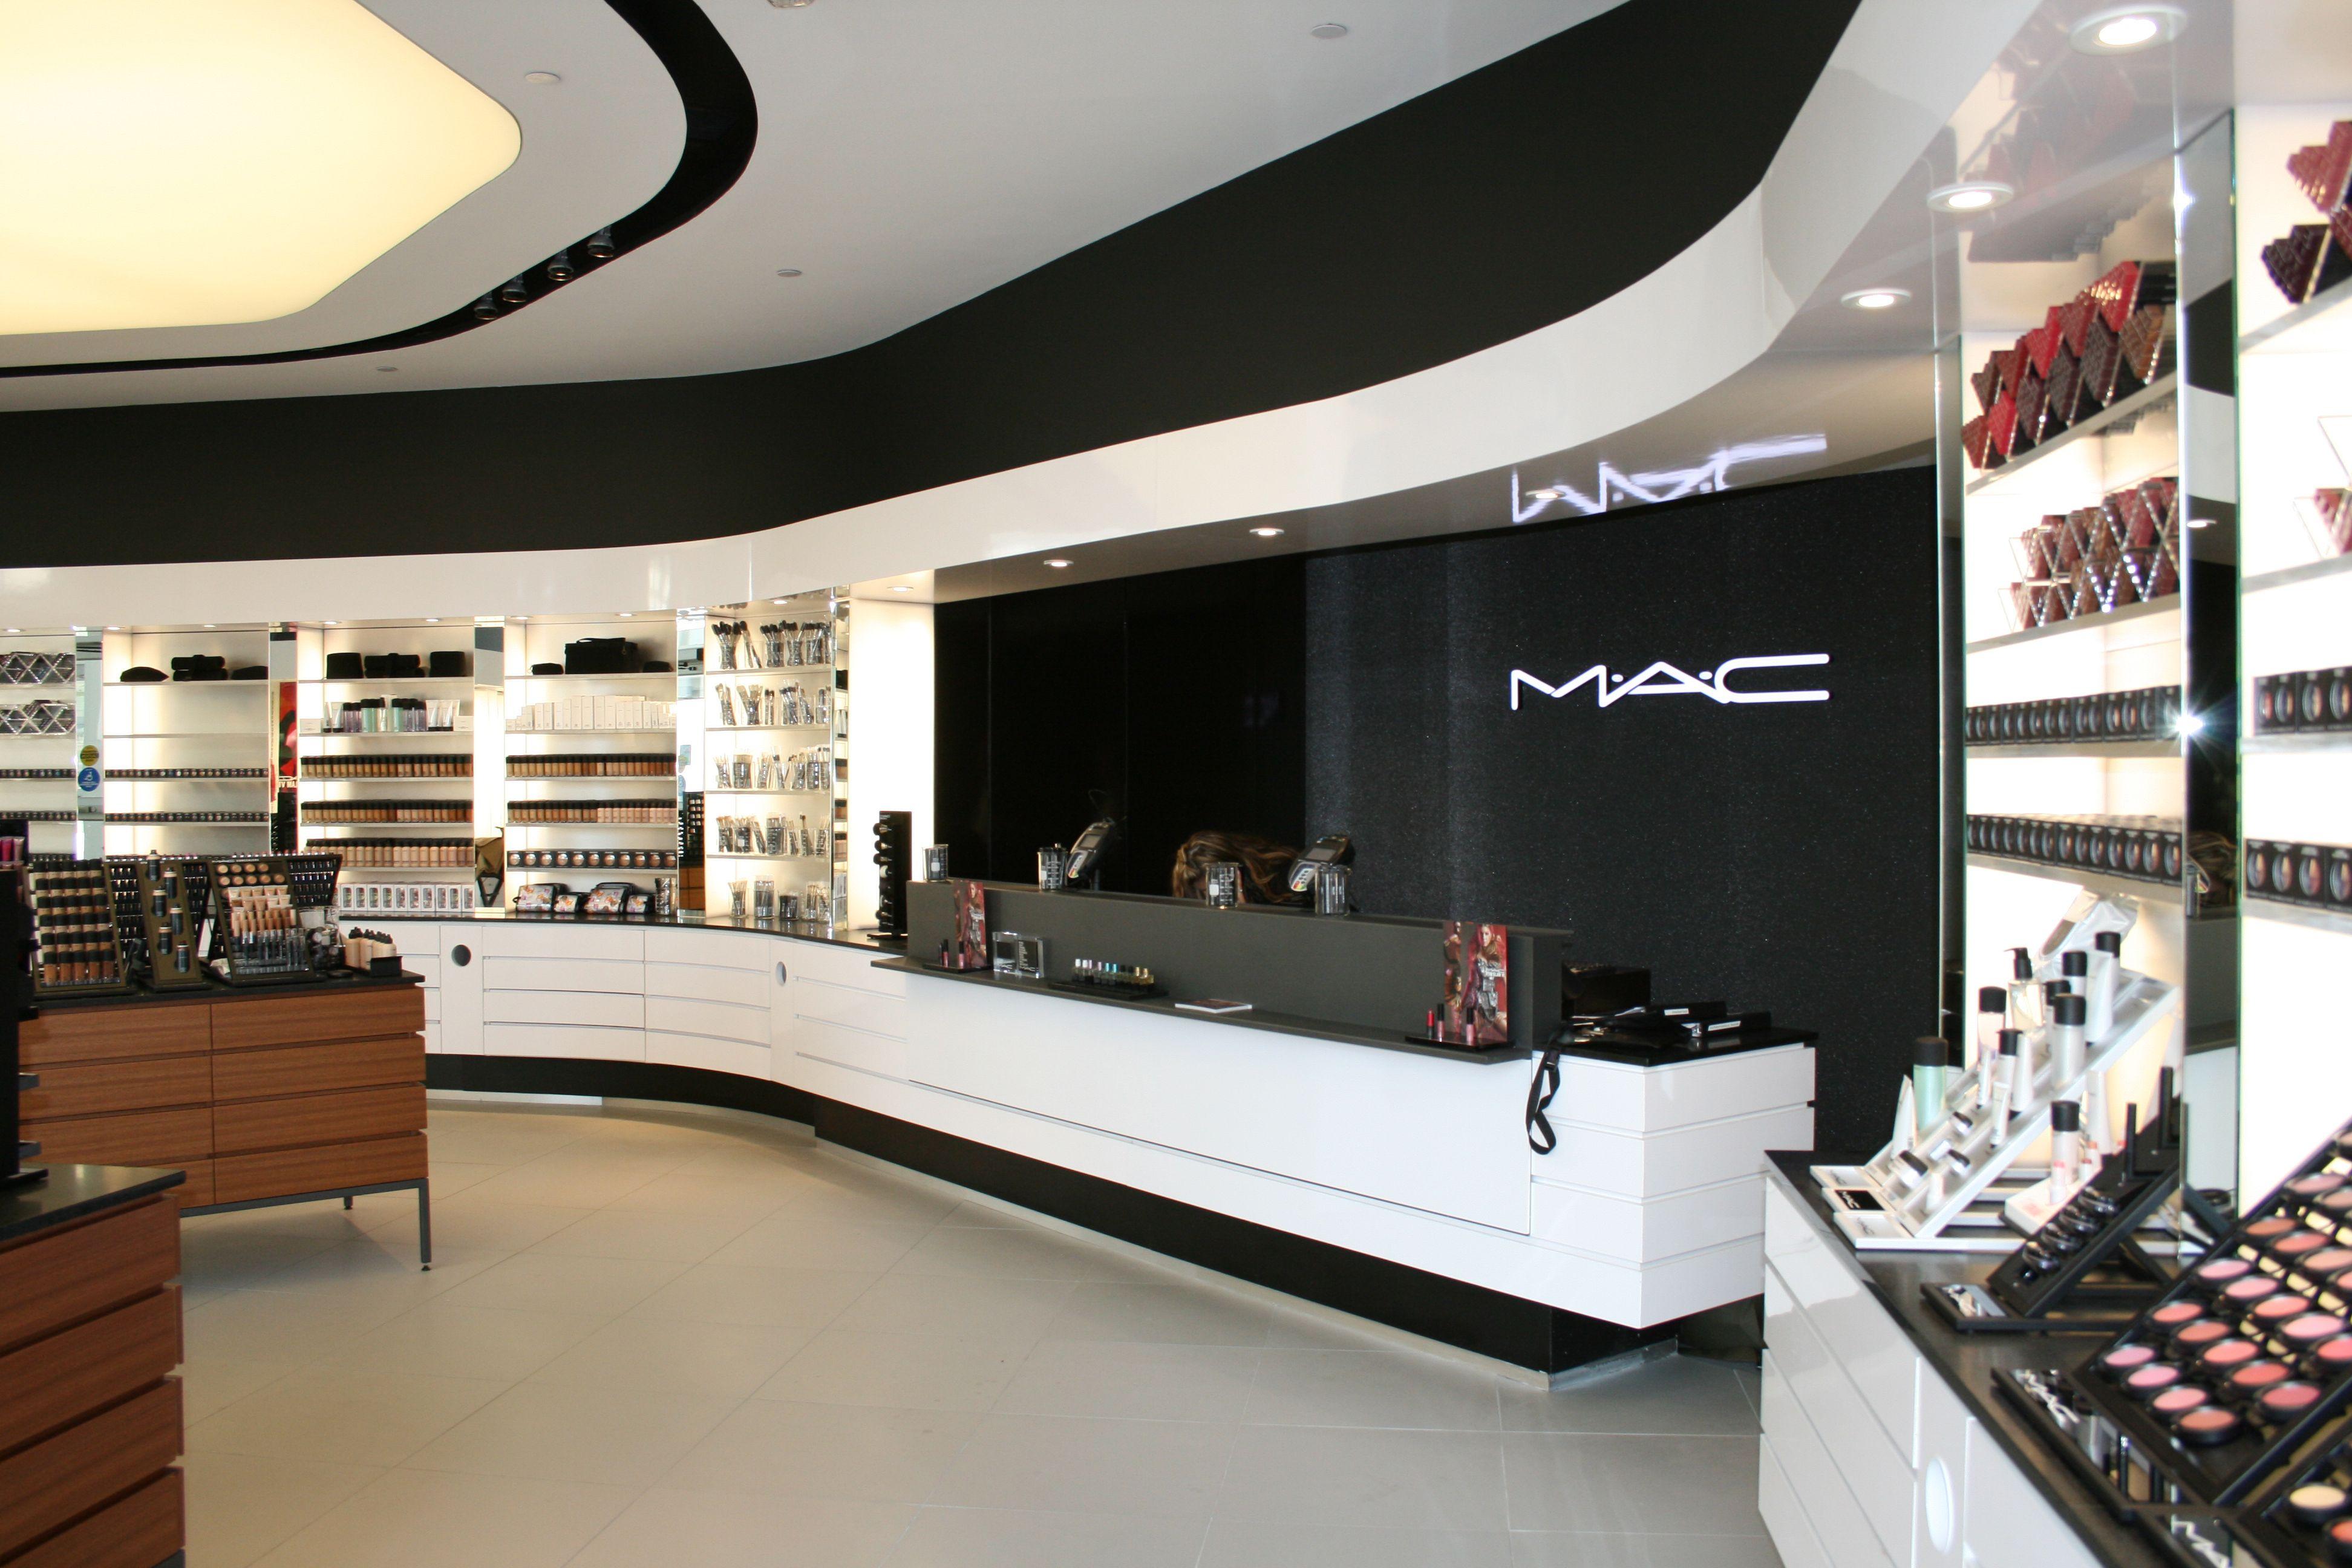 8edbd2afc Mac Store - Murano Onyx #mac #maccosmetics #macmakeup #wallpaper  #wallcoverings #innovation #innovations #usa #interior #interiordesign